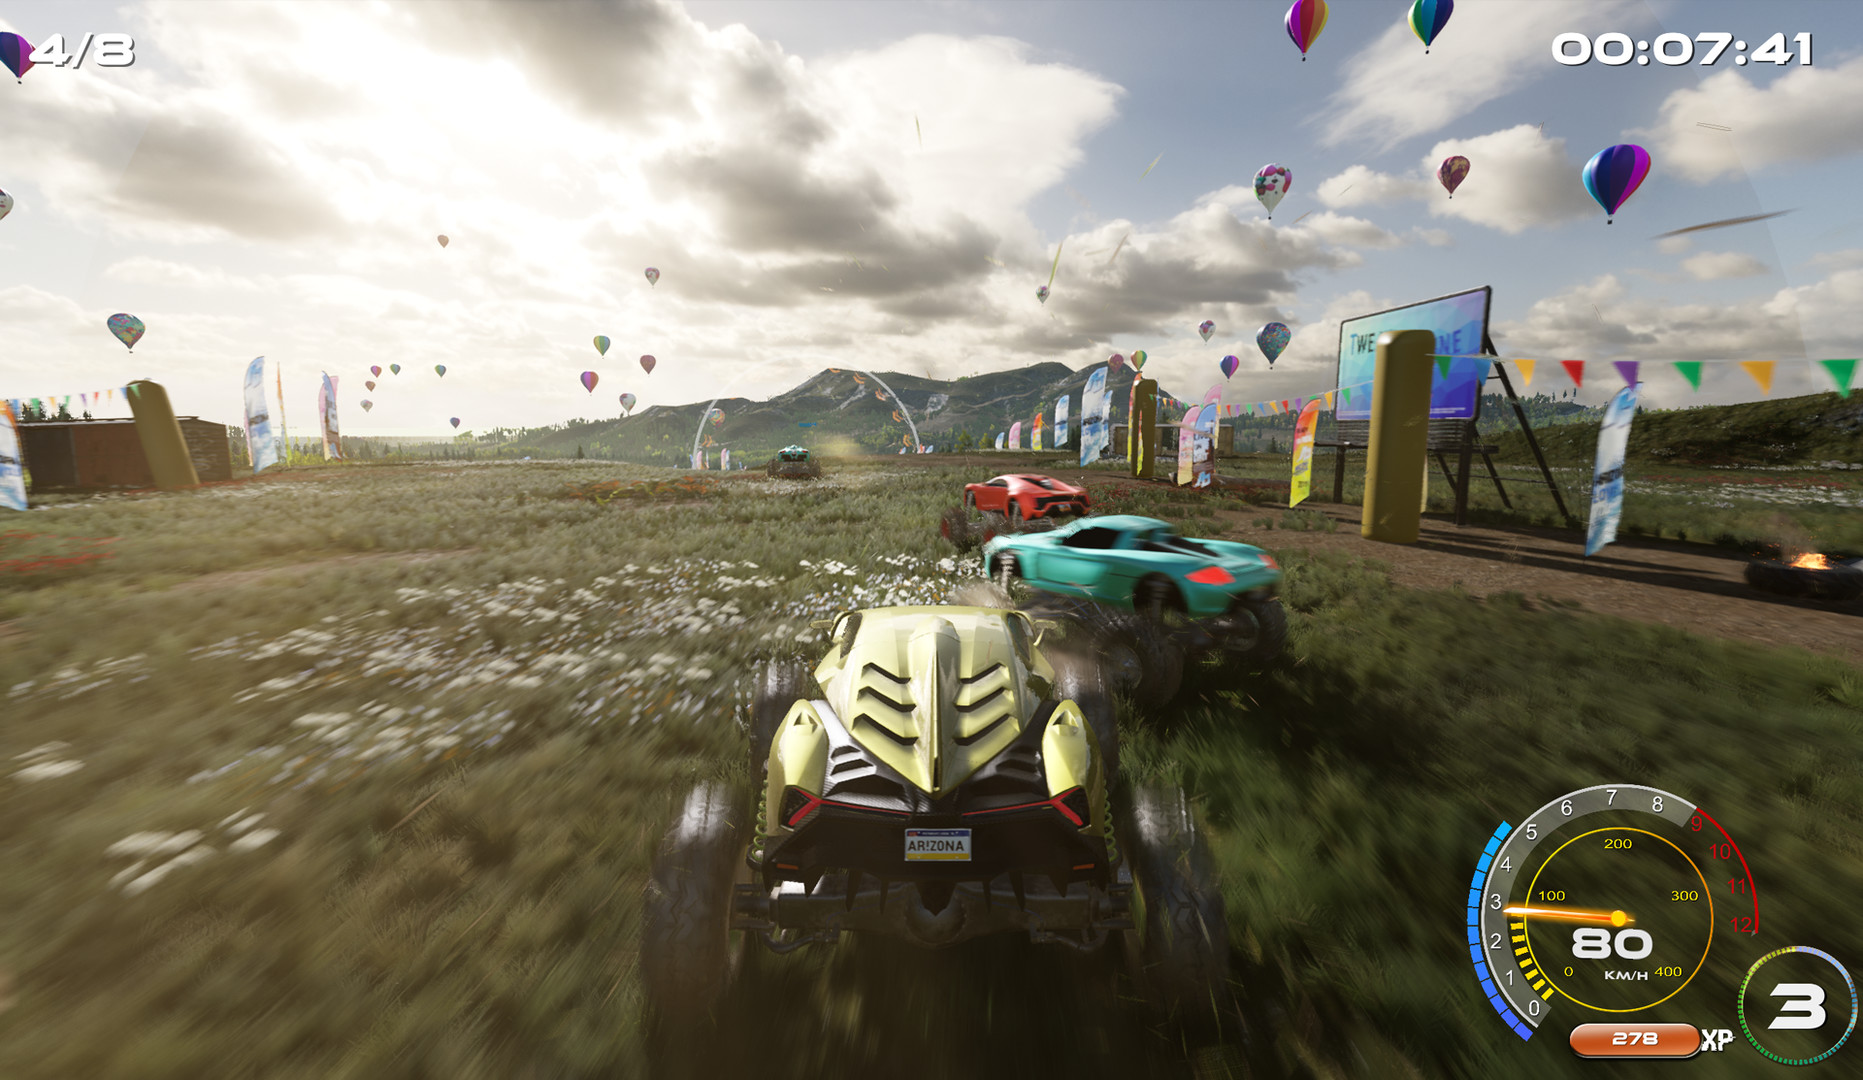 arizona-derby-pc-screenshot-1